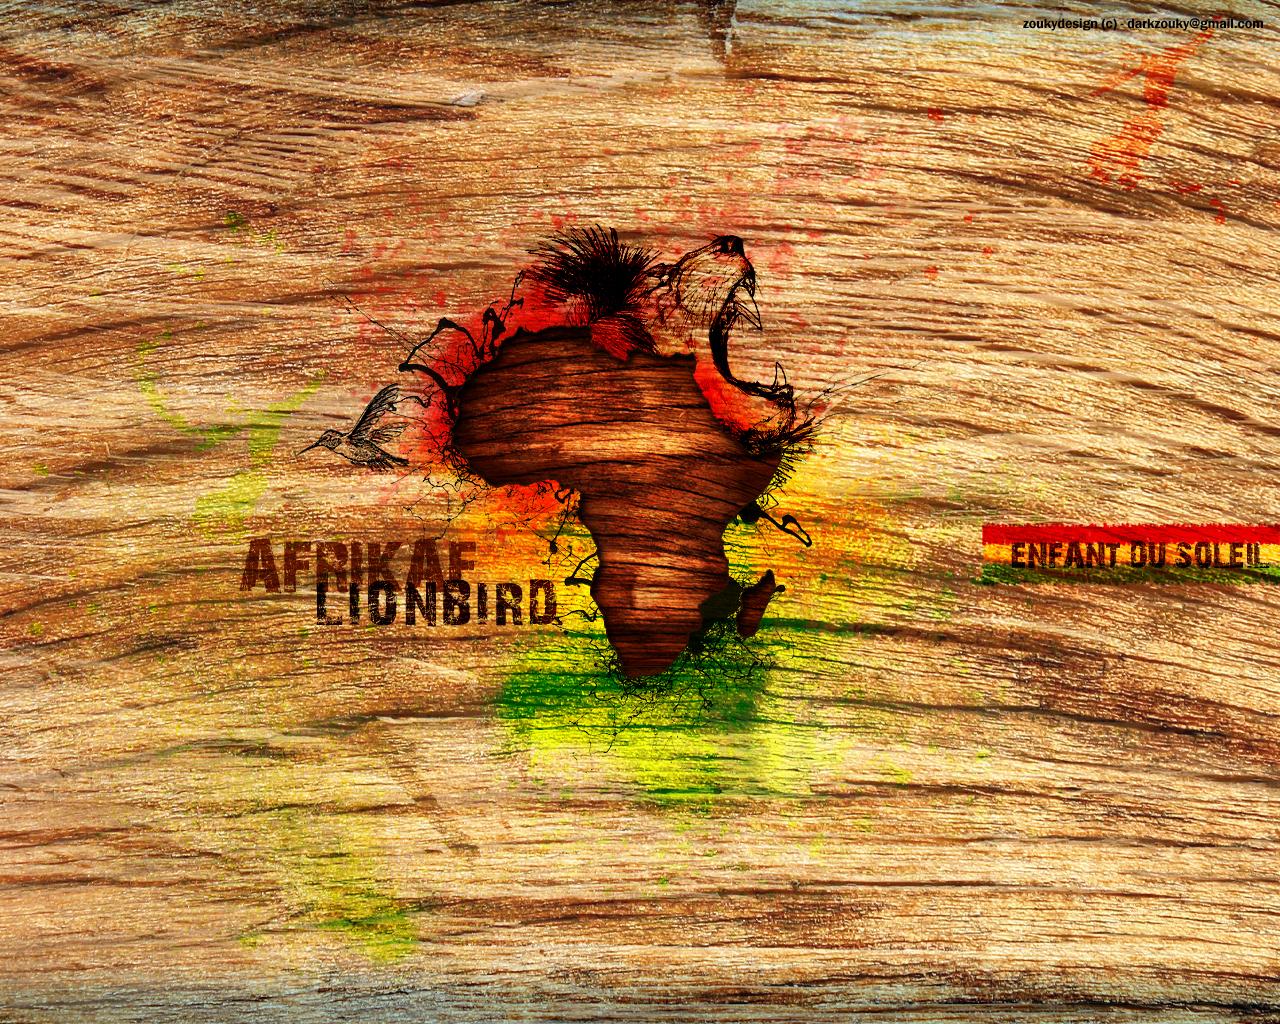 Afrikaf enfant du soleil fond d 39 cran artiste reggae for Fond d ecran gratuit 974